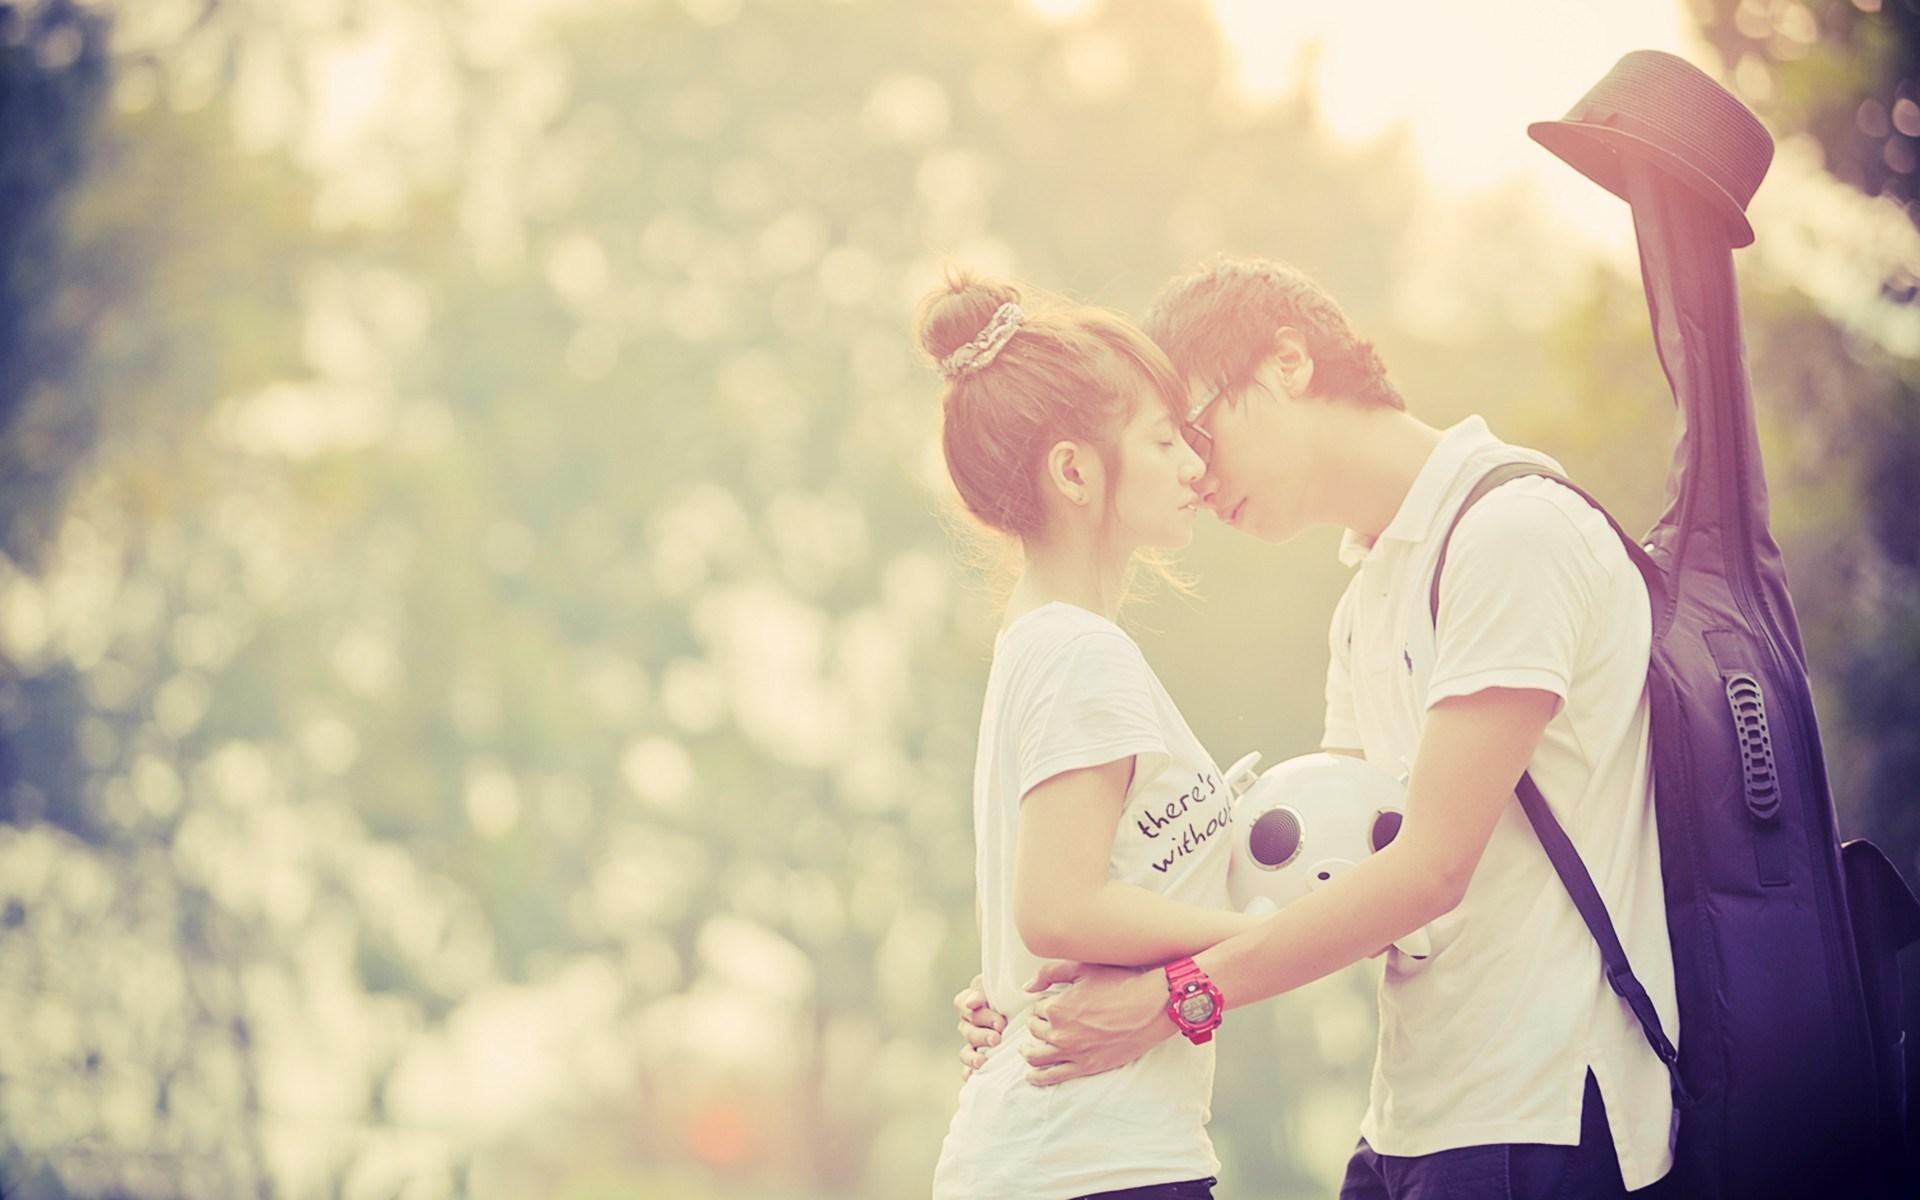 Hot-Couple-Love-Wallpaper